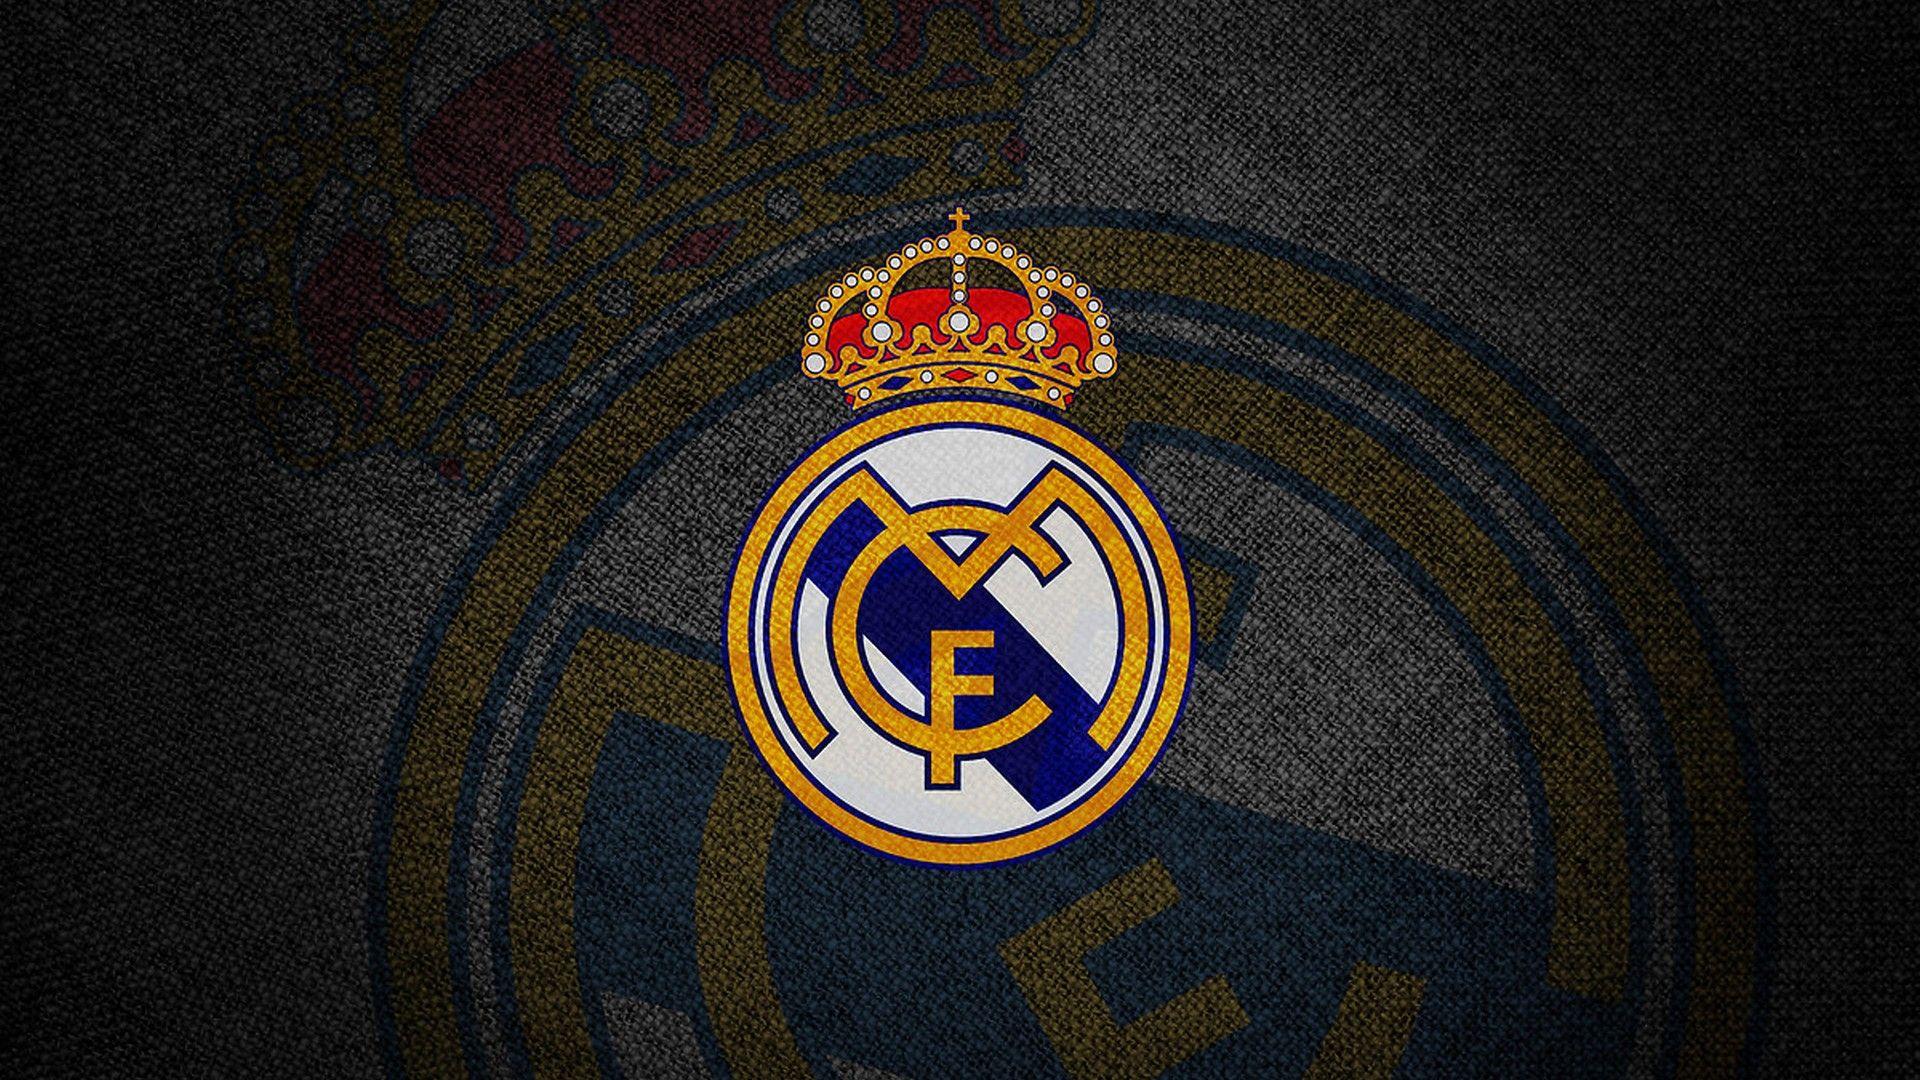 Backgrounds Real Madrid Cf Hd Best Wallpaper Hd Real Madrid Wallpapers Real Madrid Logo Wallpapers Madrid Wallpaper